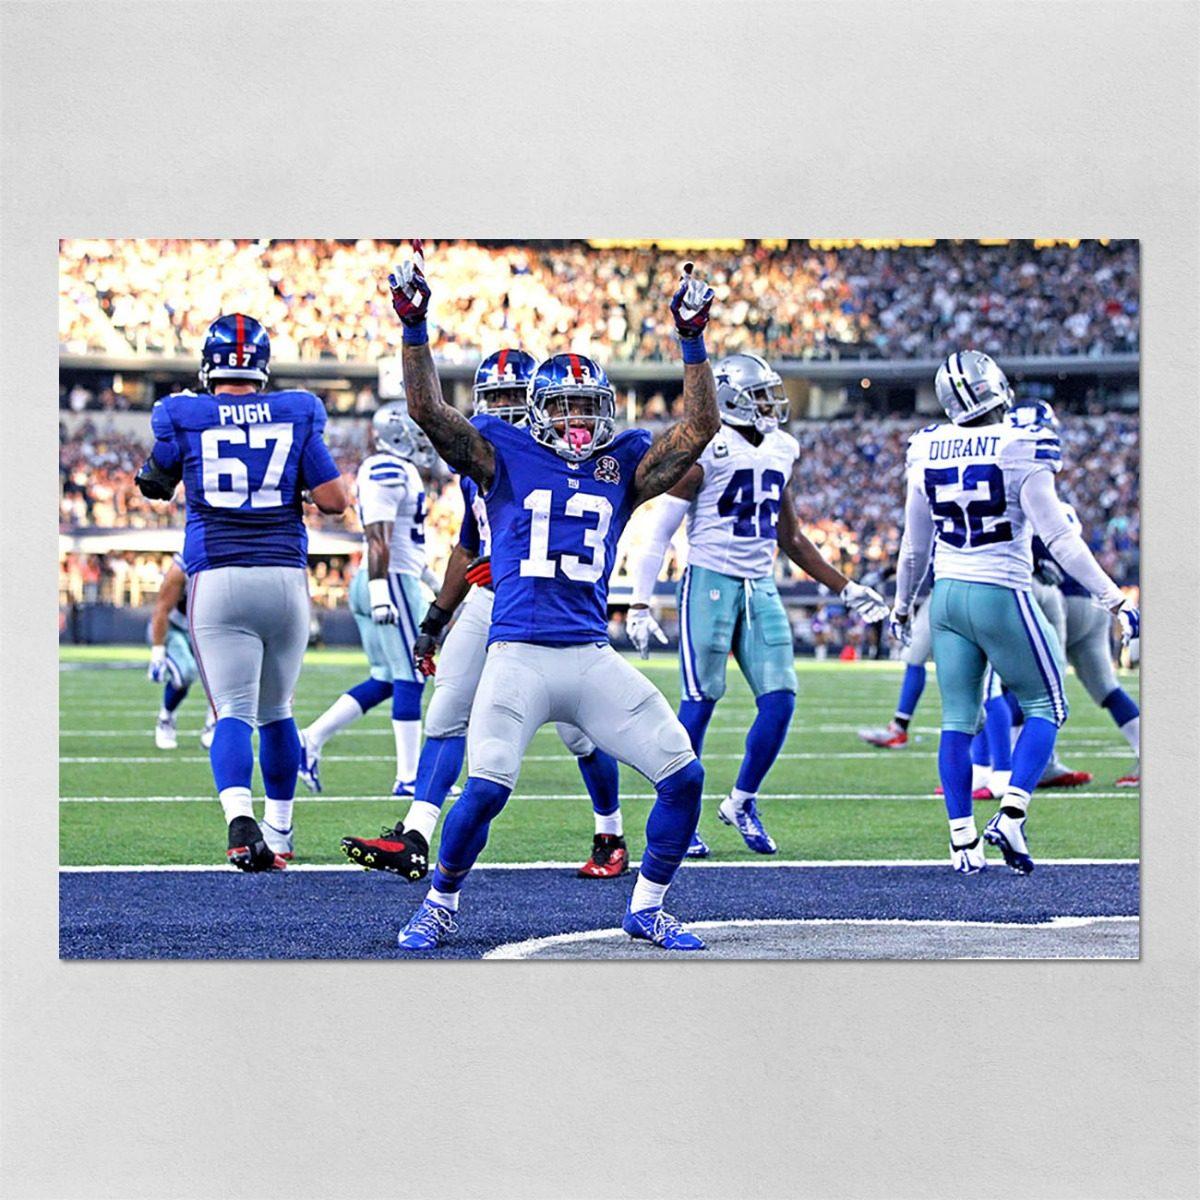 4676ef863 poster 40x60cm futebol americano nfl ny giants 57. Carregando zoom.